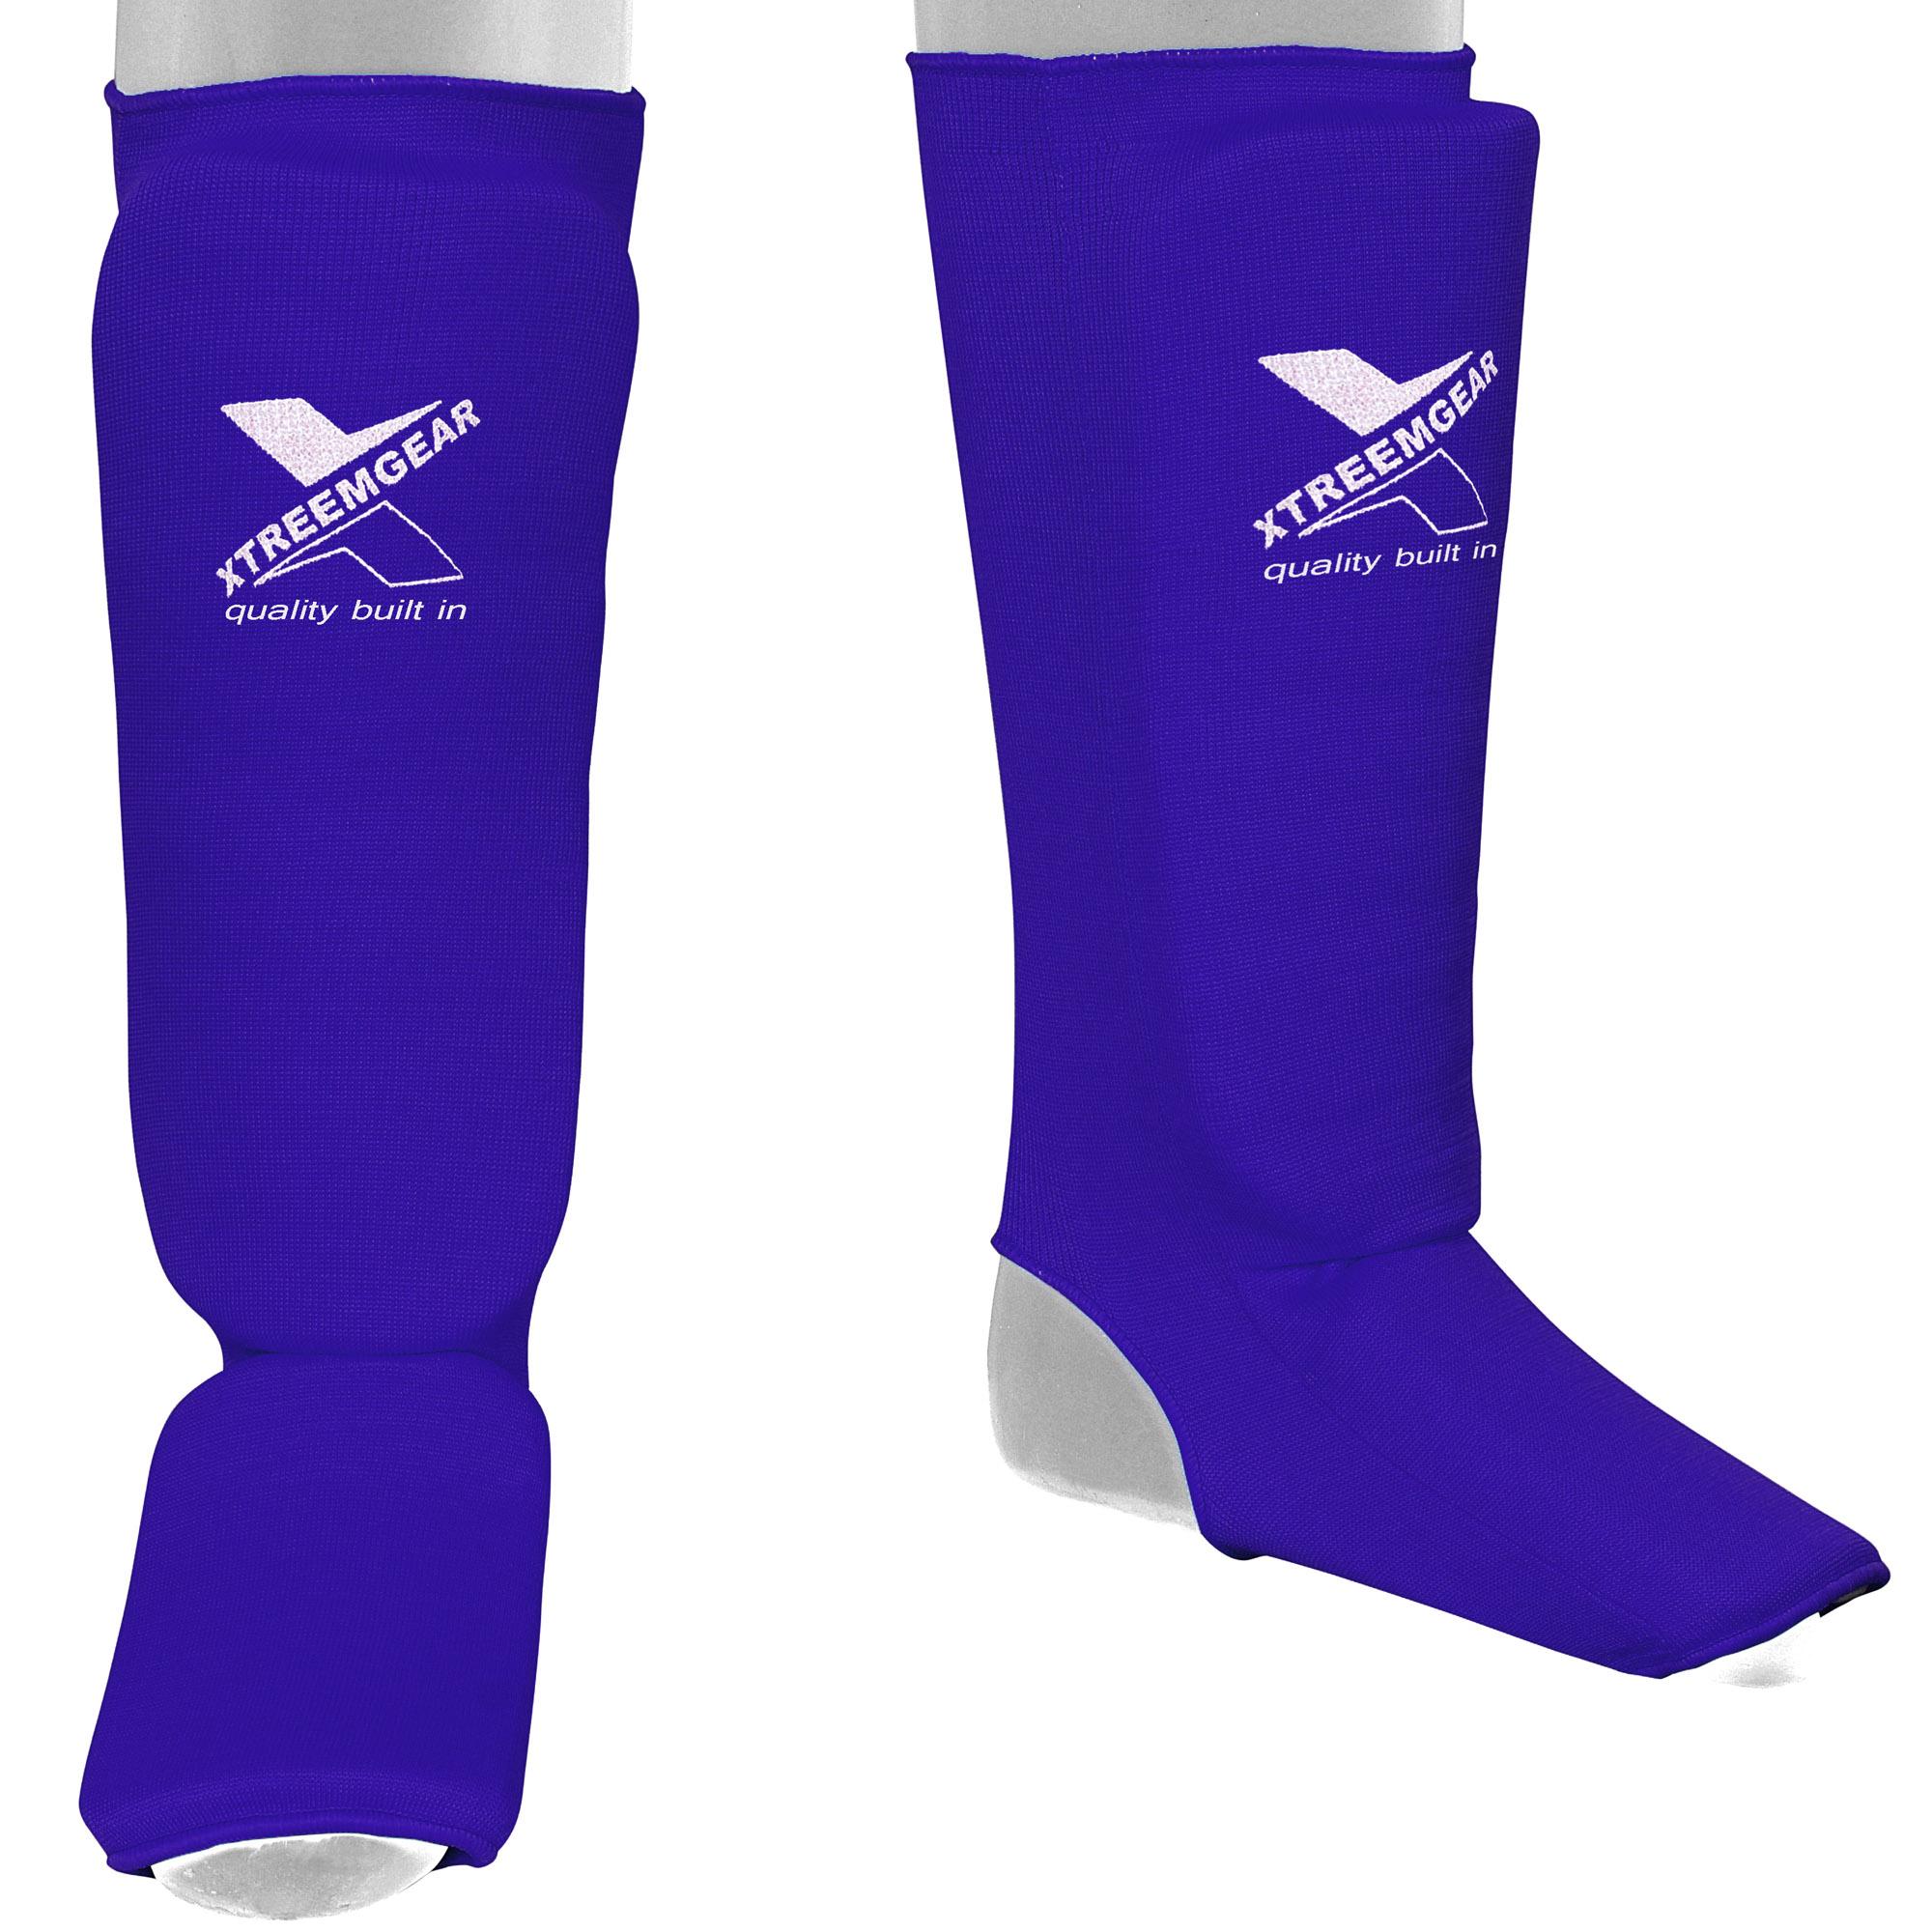 Shin Pad Leg & Foot Guards Muay Thai Kick Boxing Guard Protector,Blue SP1 (XL)